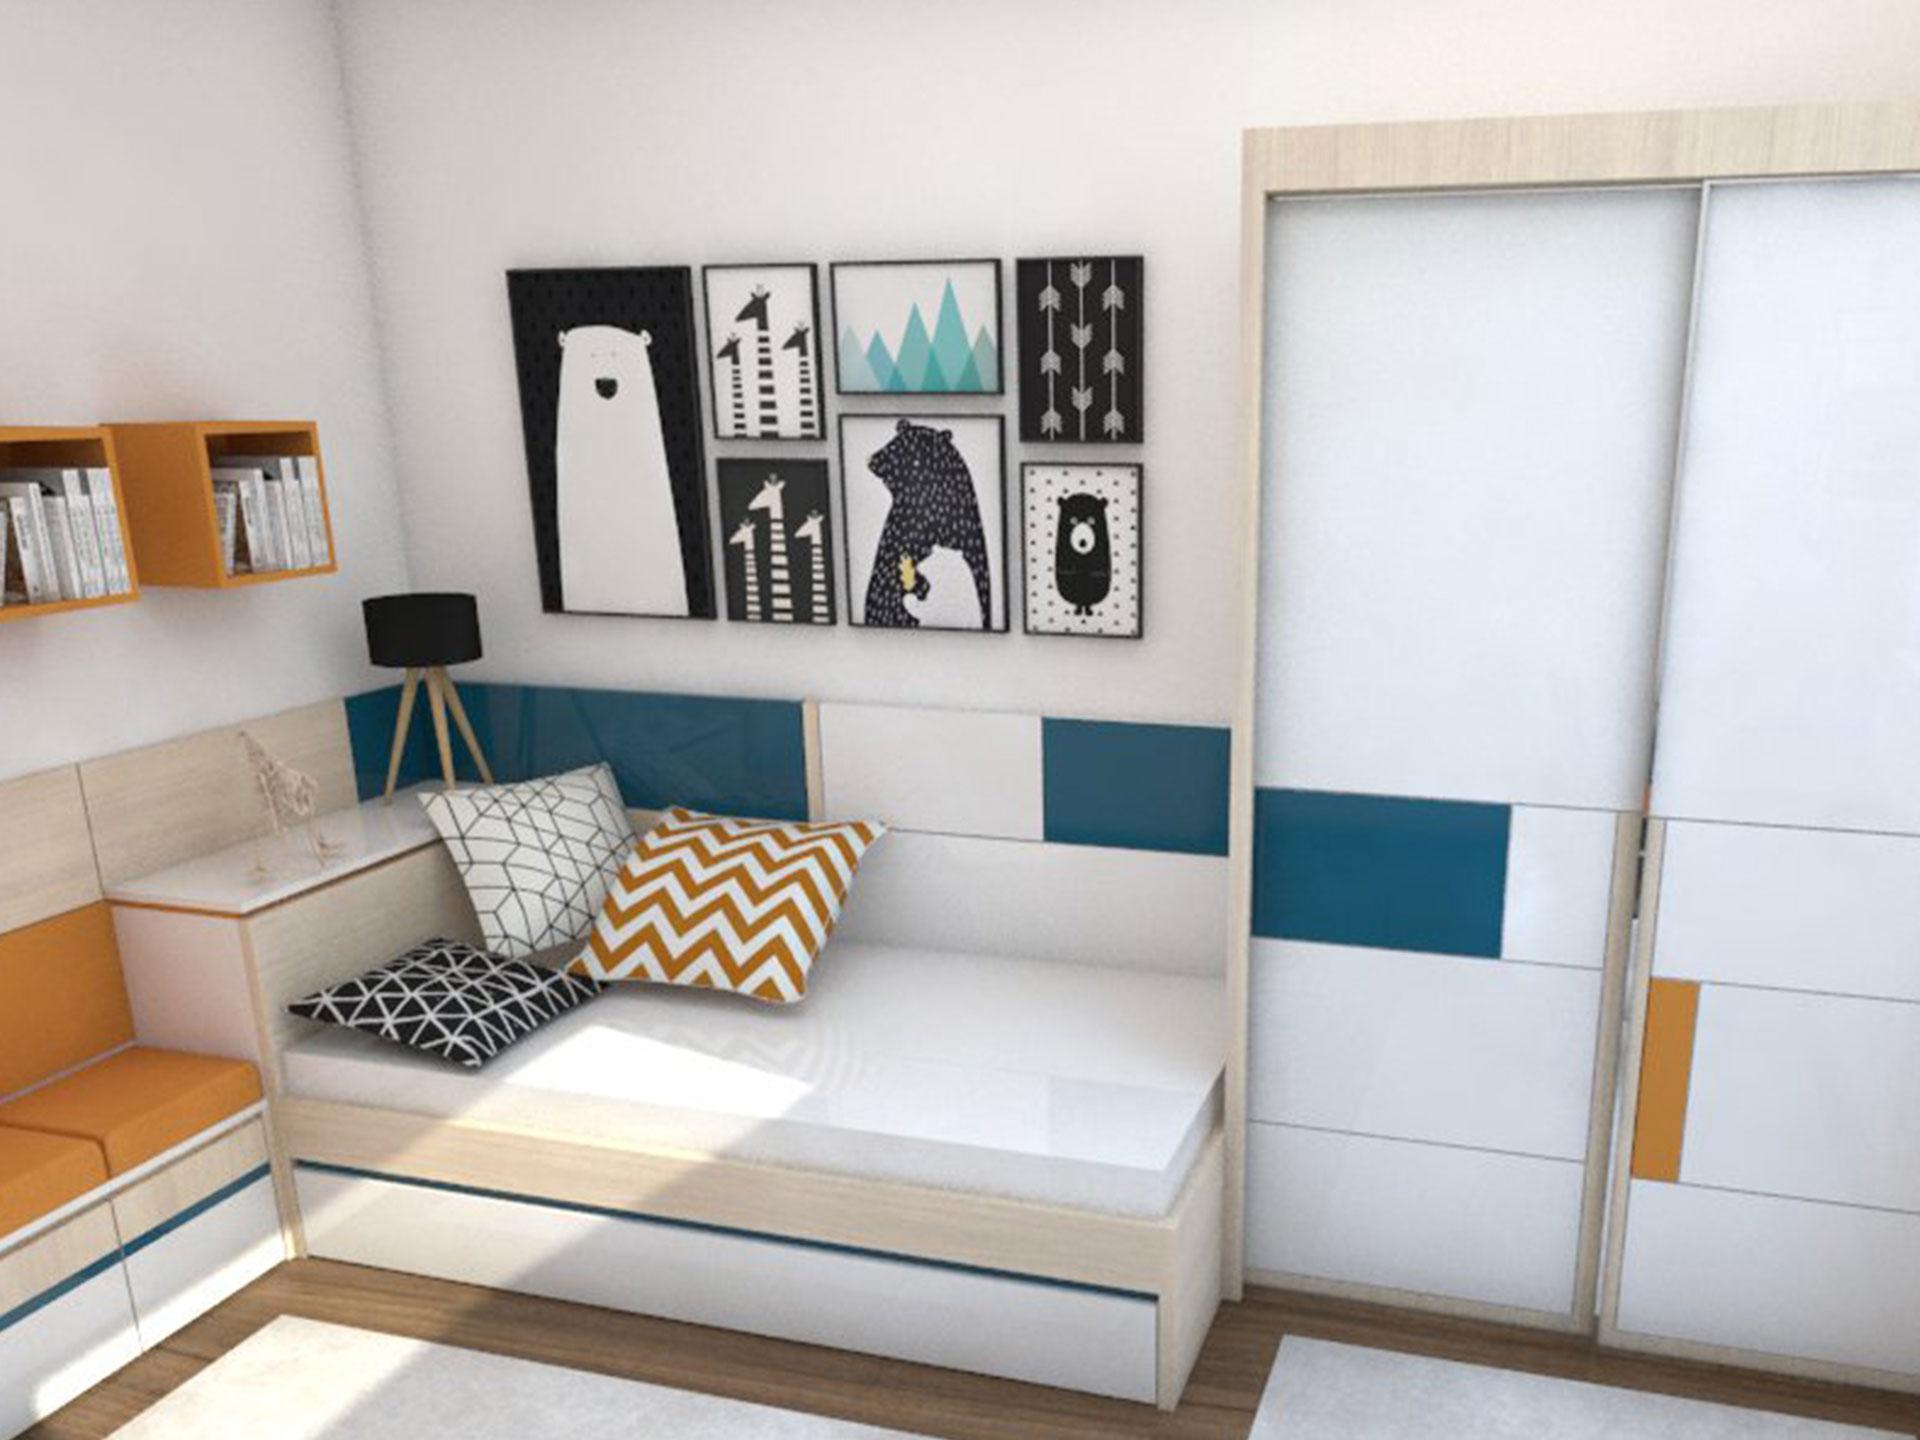 XYLON | Dizajn enterijera i nameštaja | Soba za tinejdžere